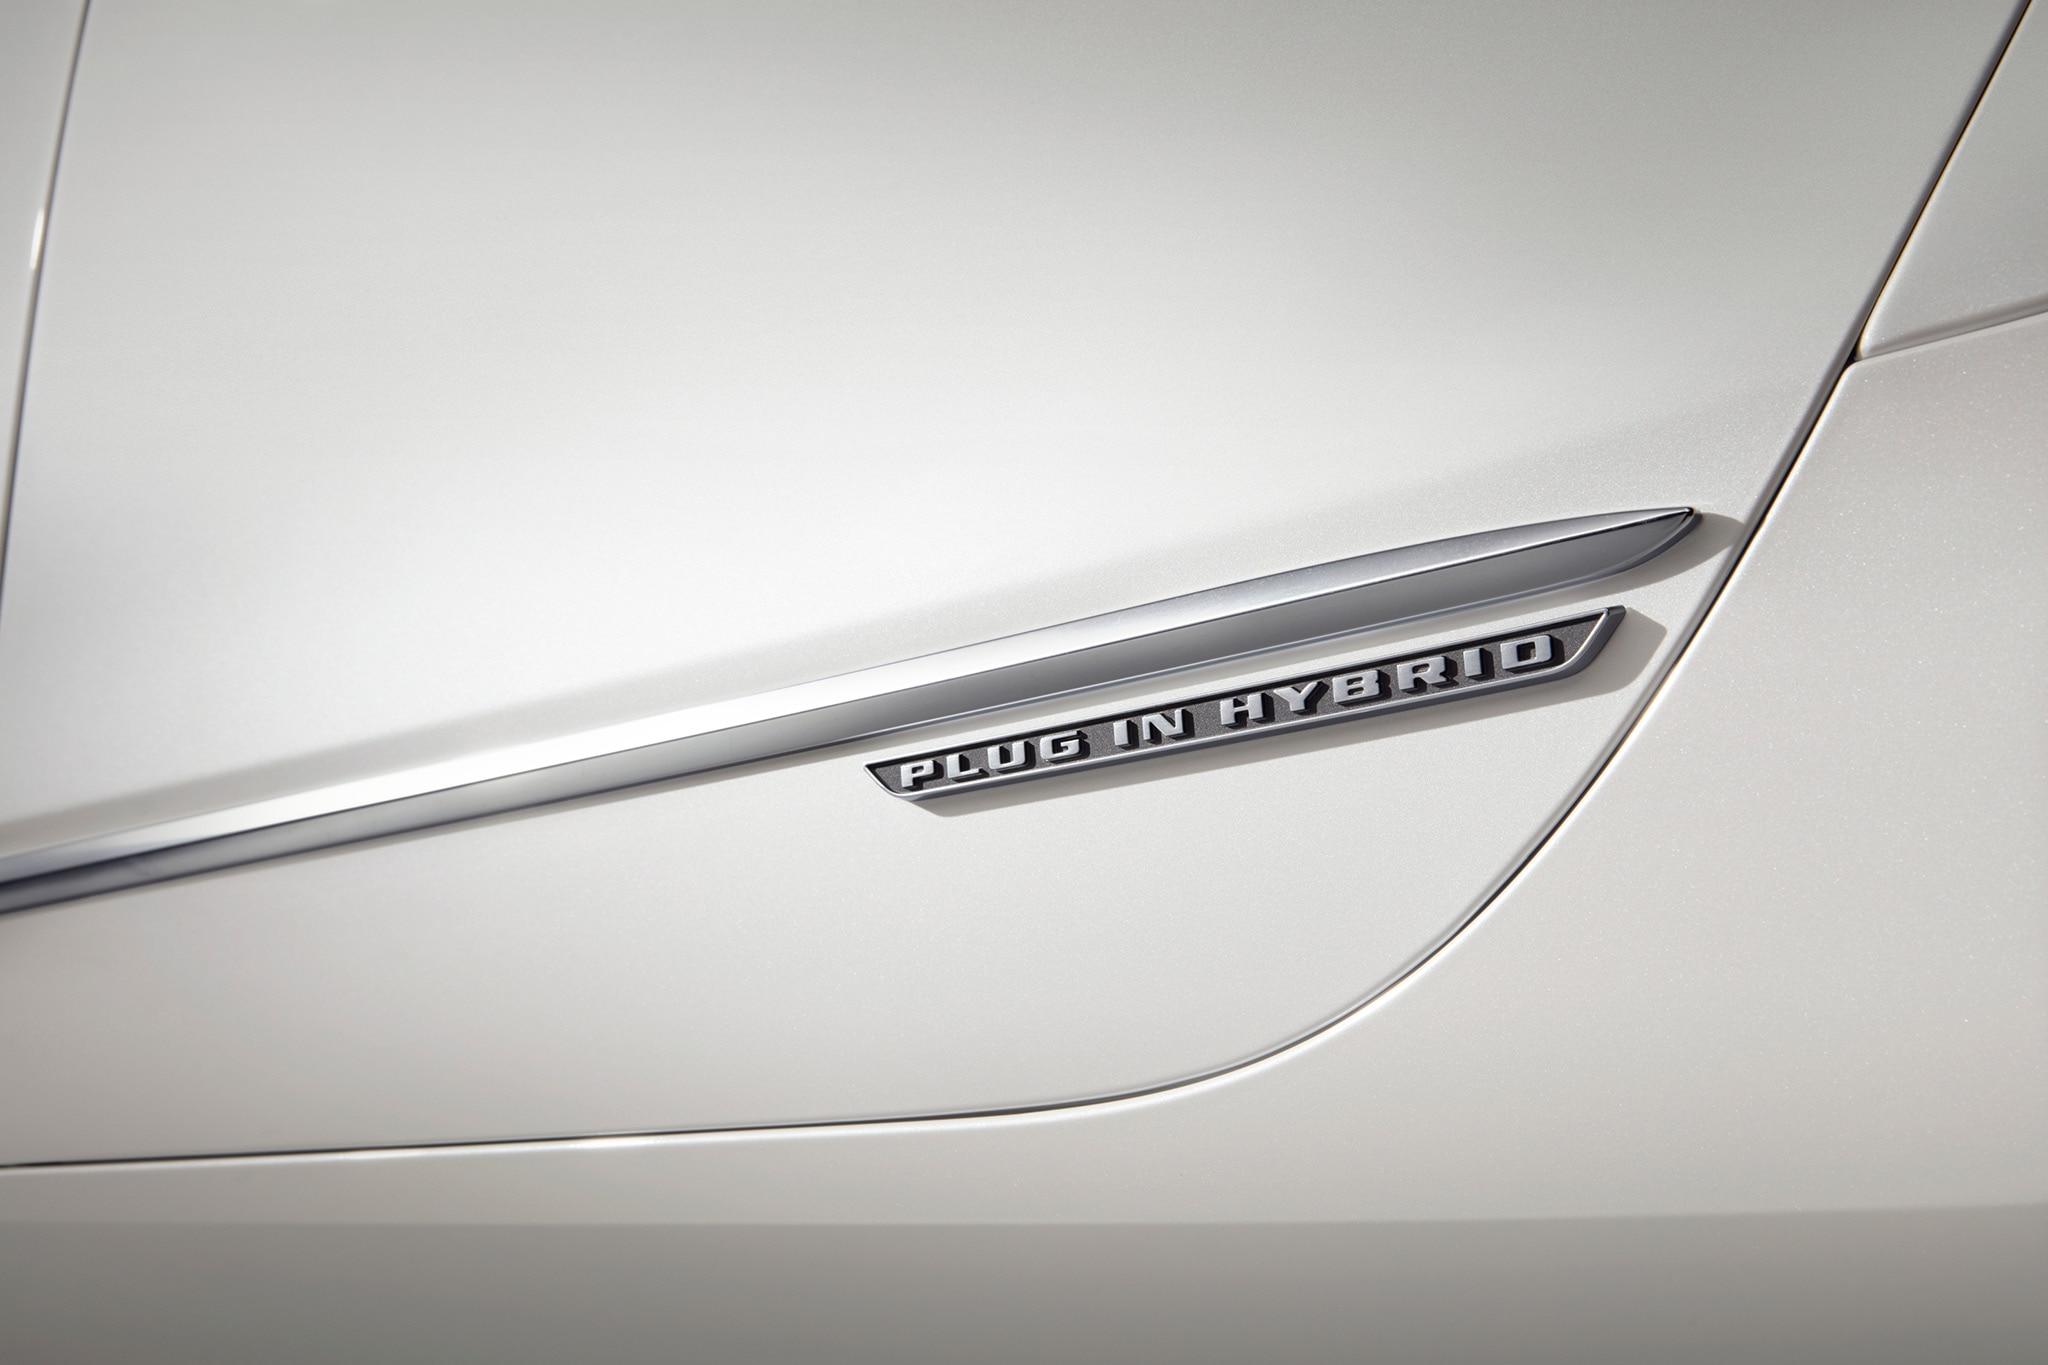 2017 Cadillac CT6 Plug In Hybrid Door Badge